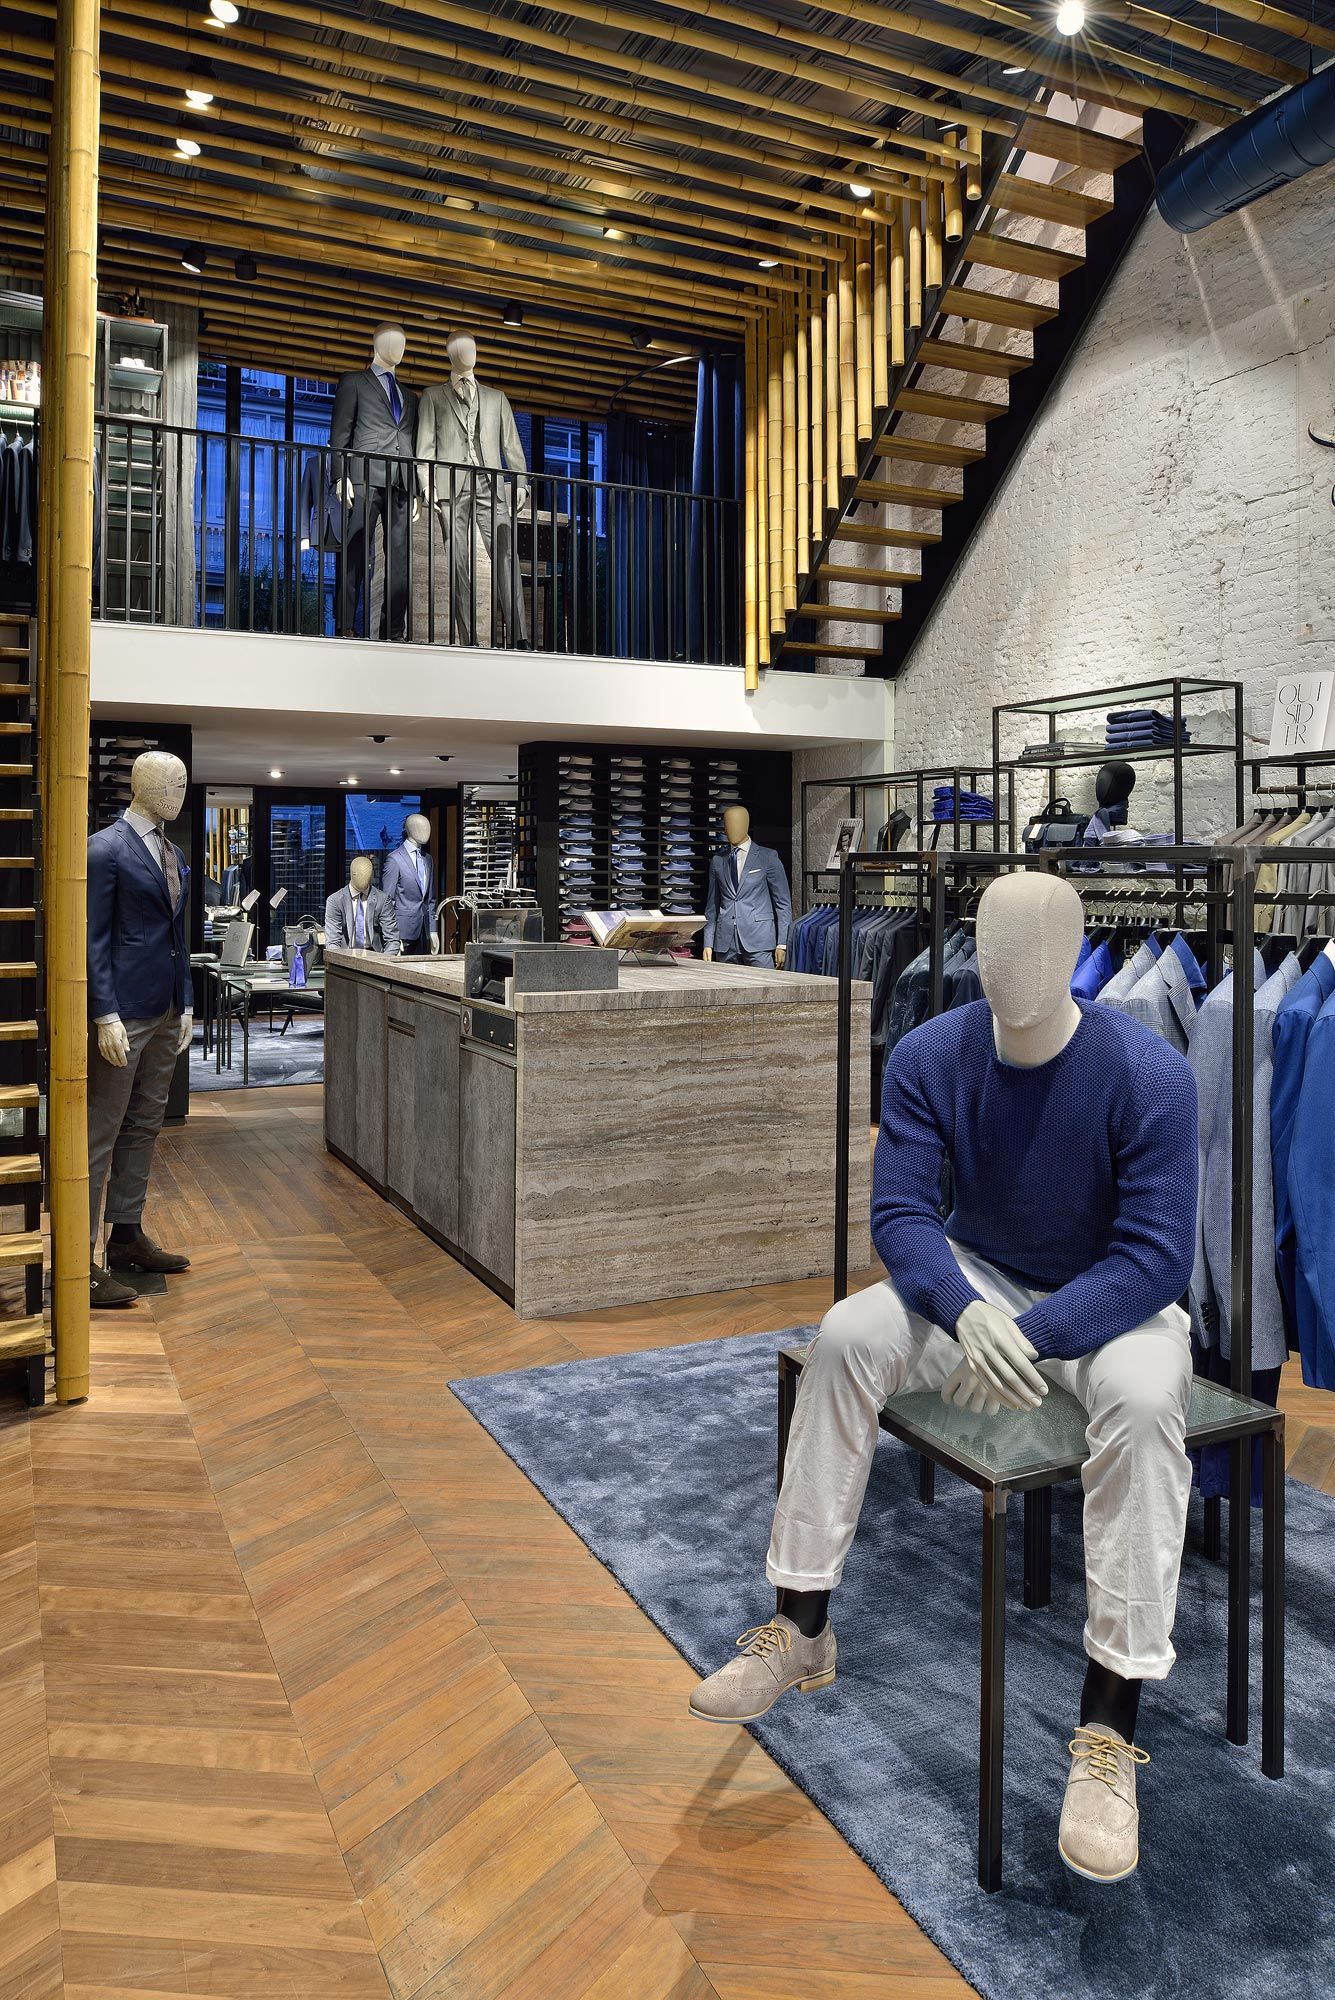 Interieur Van Gils winkel Baerlestraat - interieurfotograaf Chiel de Nooyer